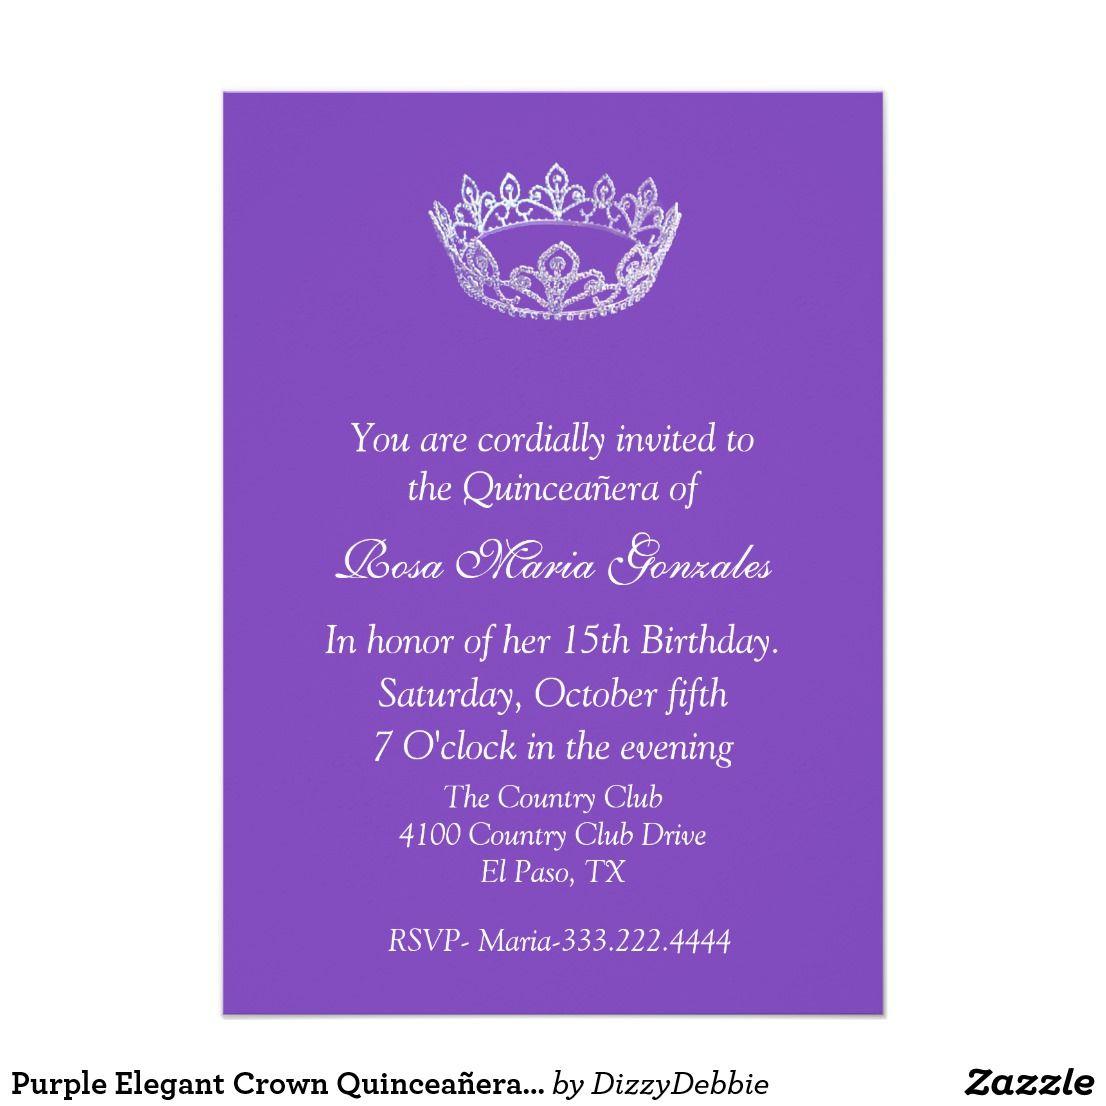 Purple Elegant Crown Quinceañera Invitation Lovely purple colored ...